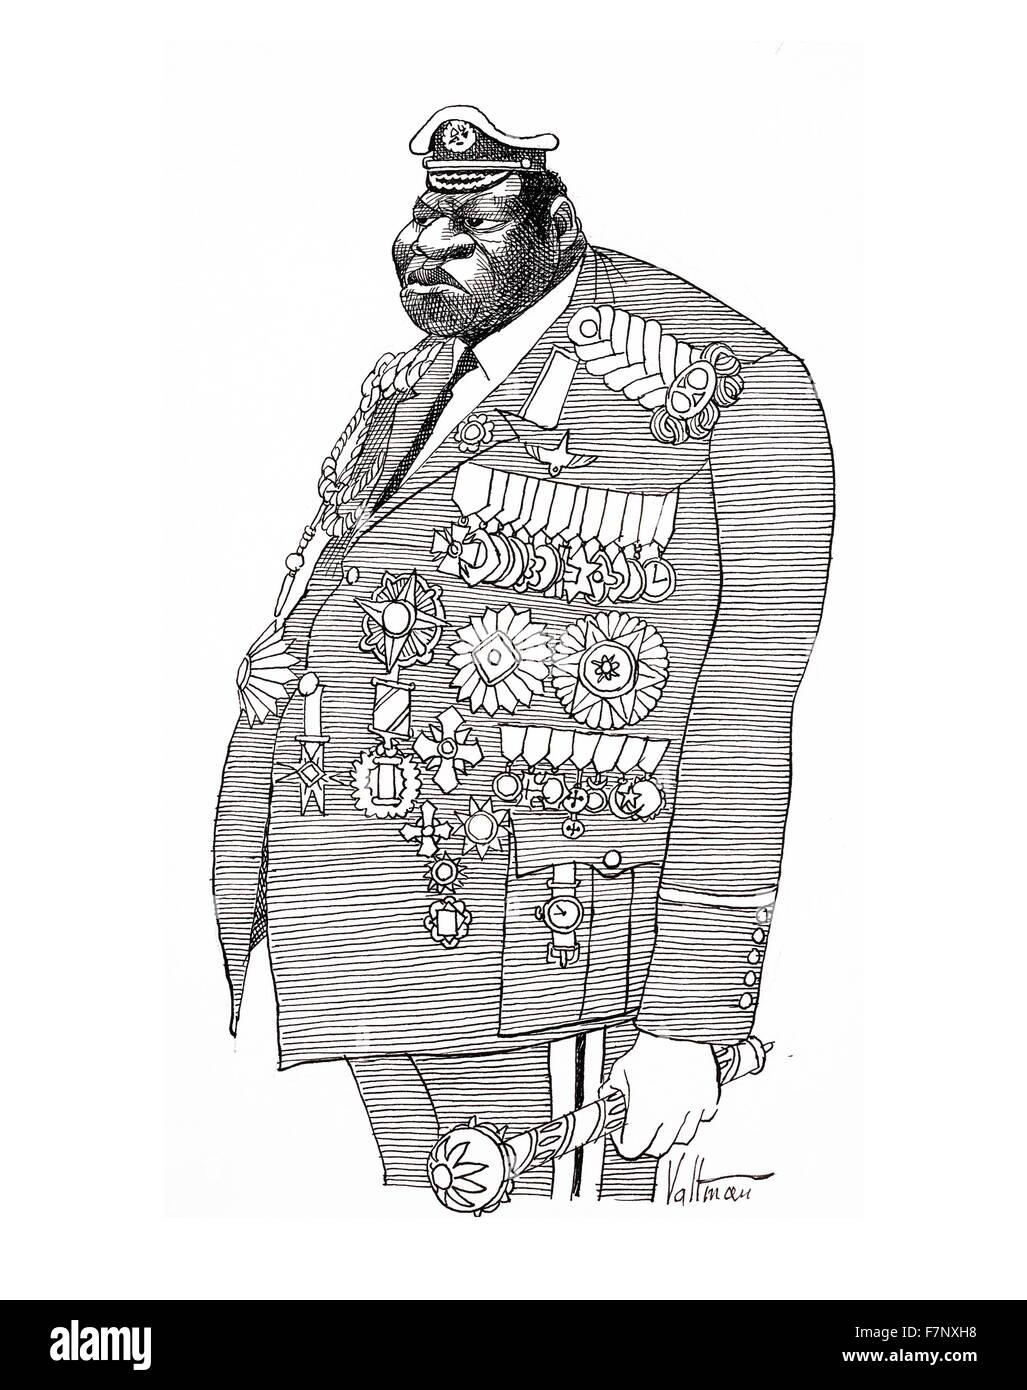 Caricature montrant Field Marshall, Idi Amin Dada (ch. 1925 - 16 août 2003) Président de l'Ouganda, Photo Stock